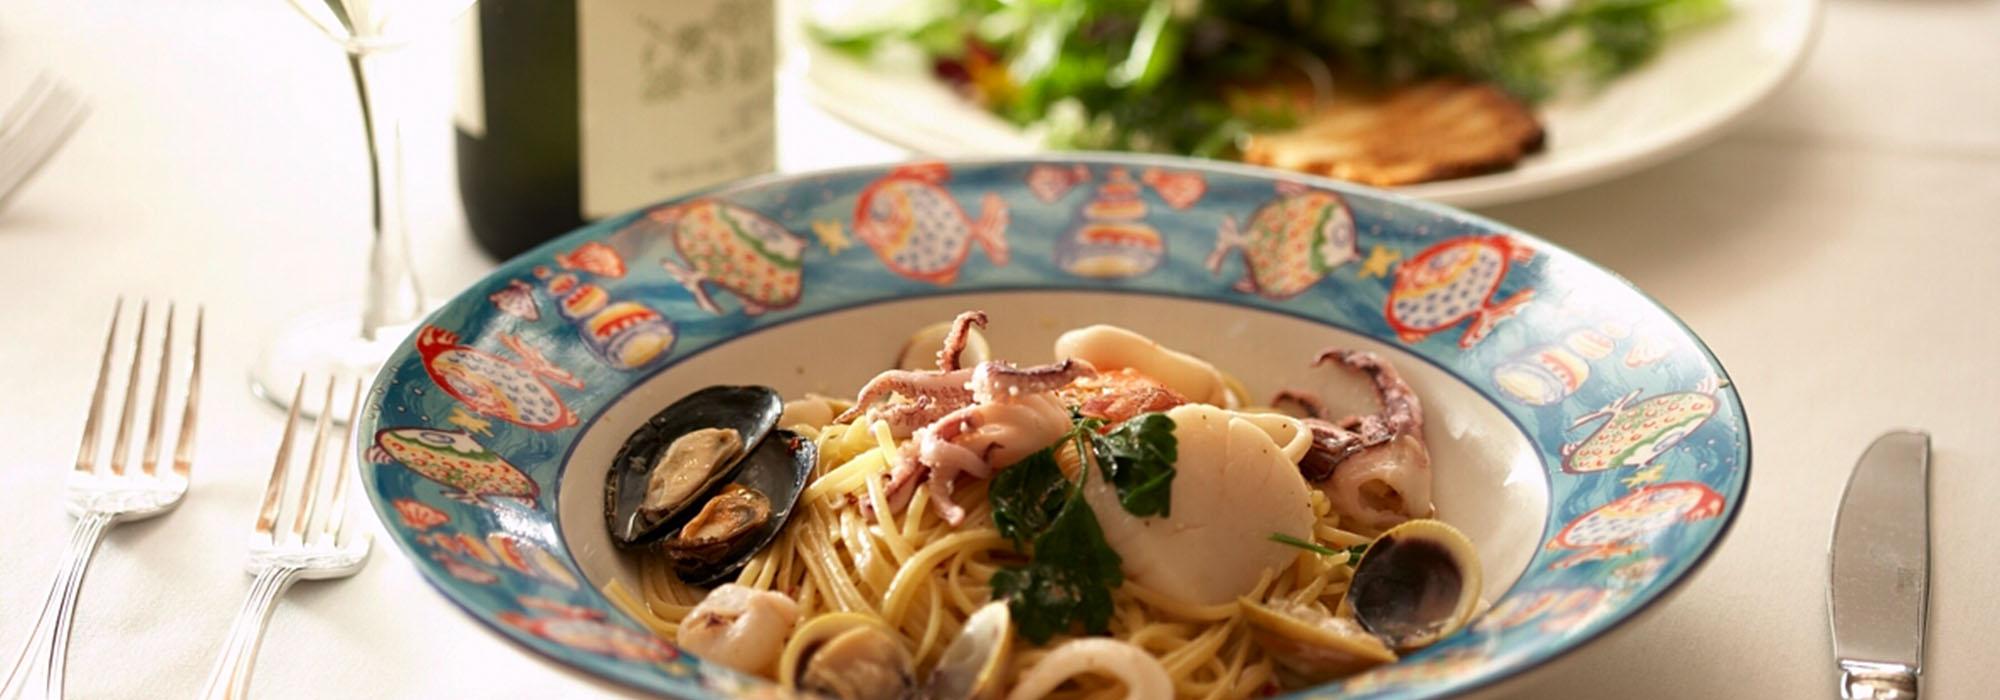 seafood-pasta-001